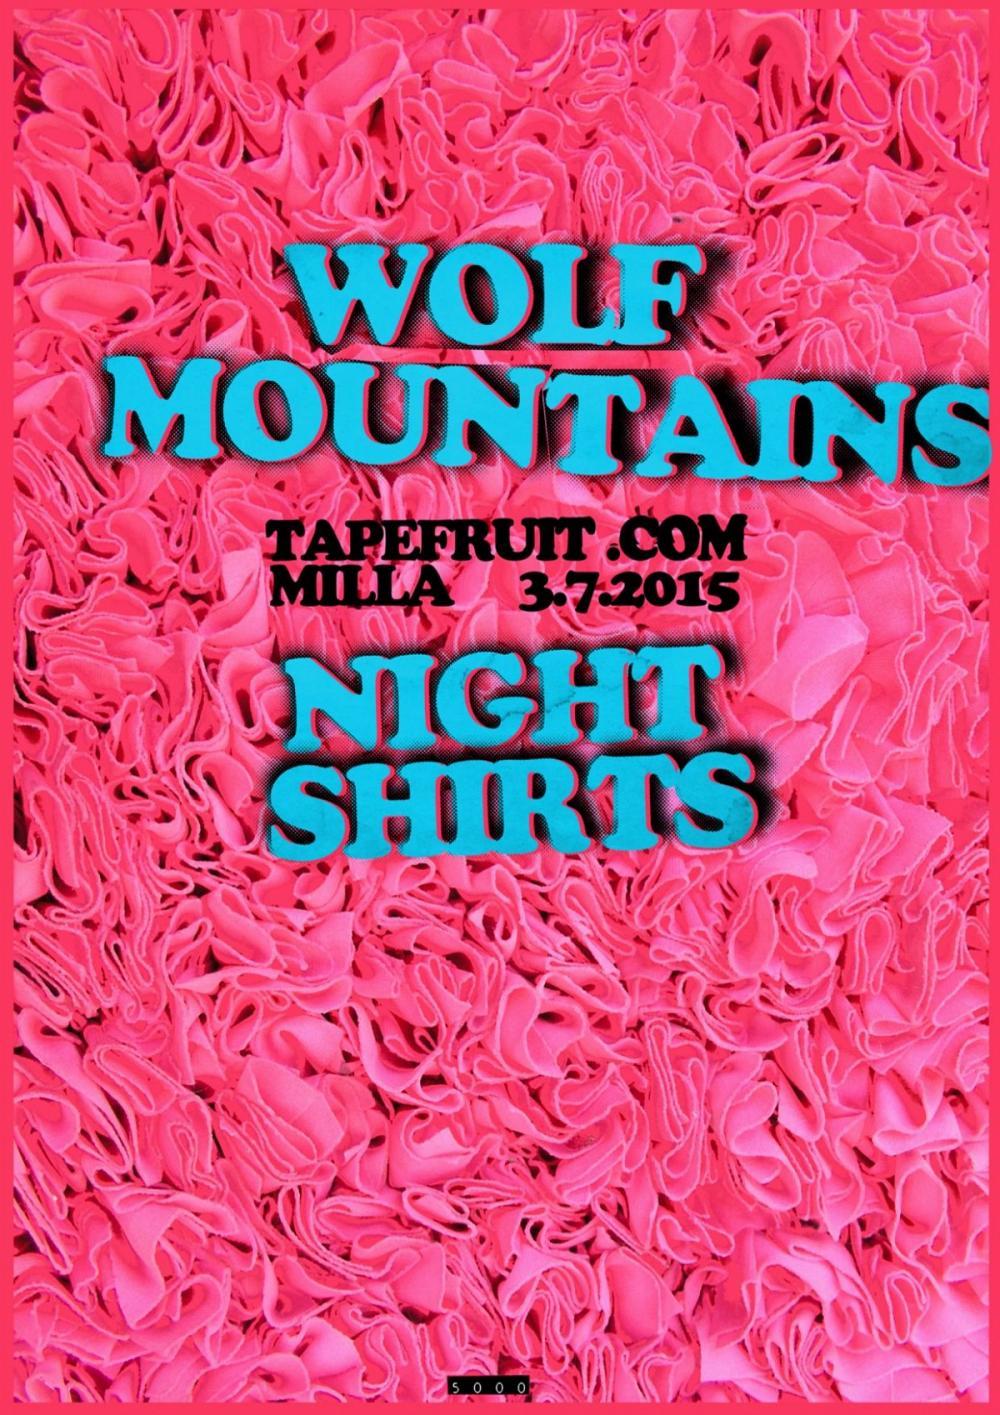 Tapefruit Konzert: Wolf Mountains + Night Shirts | 03.07.2015 @ Milla Club